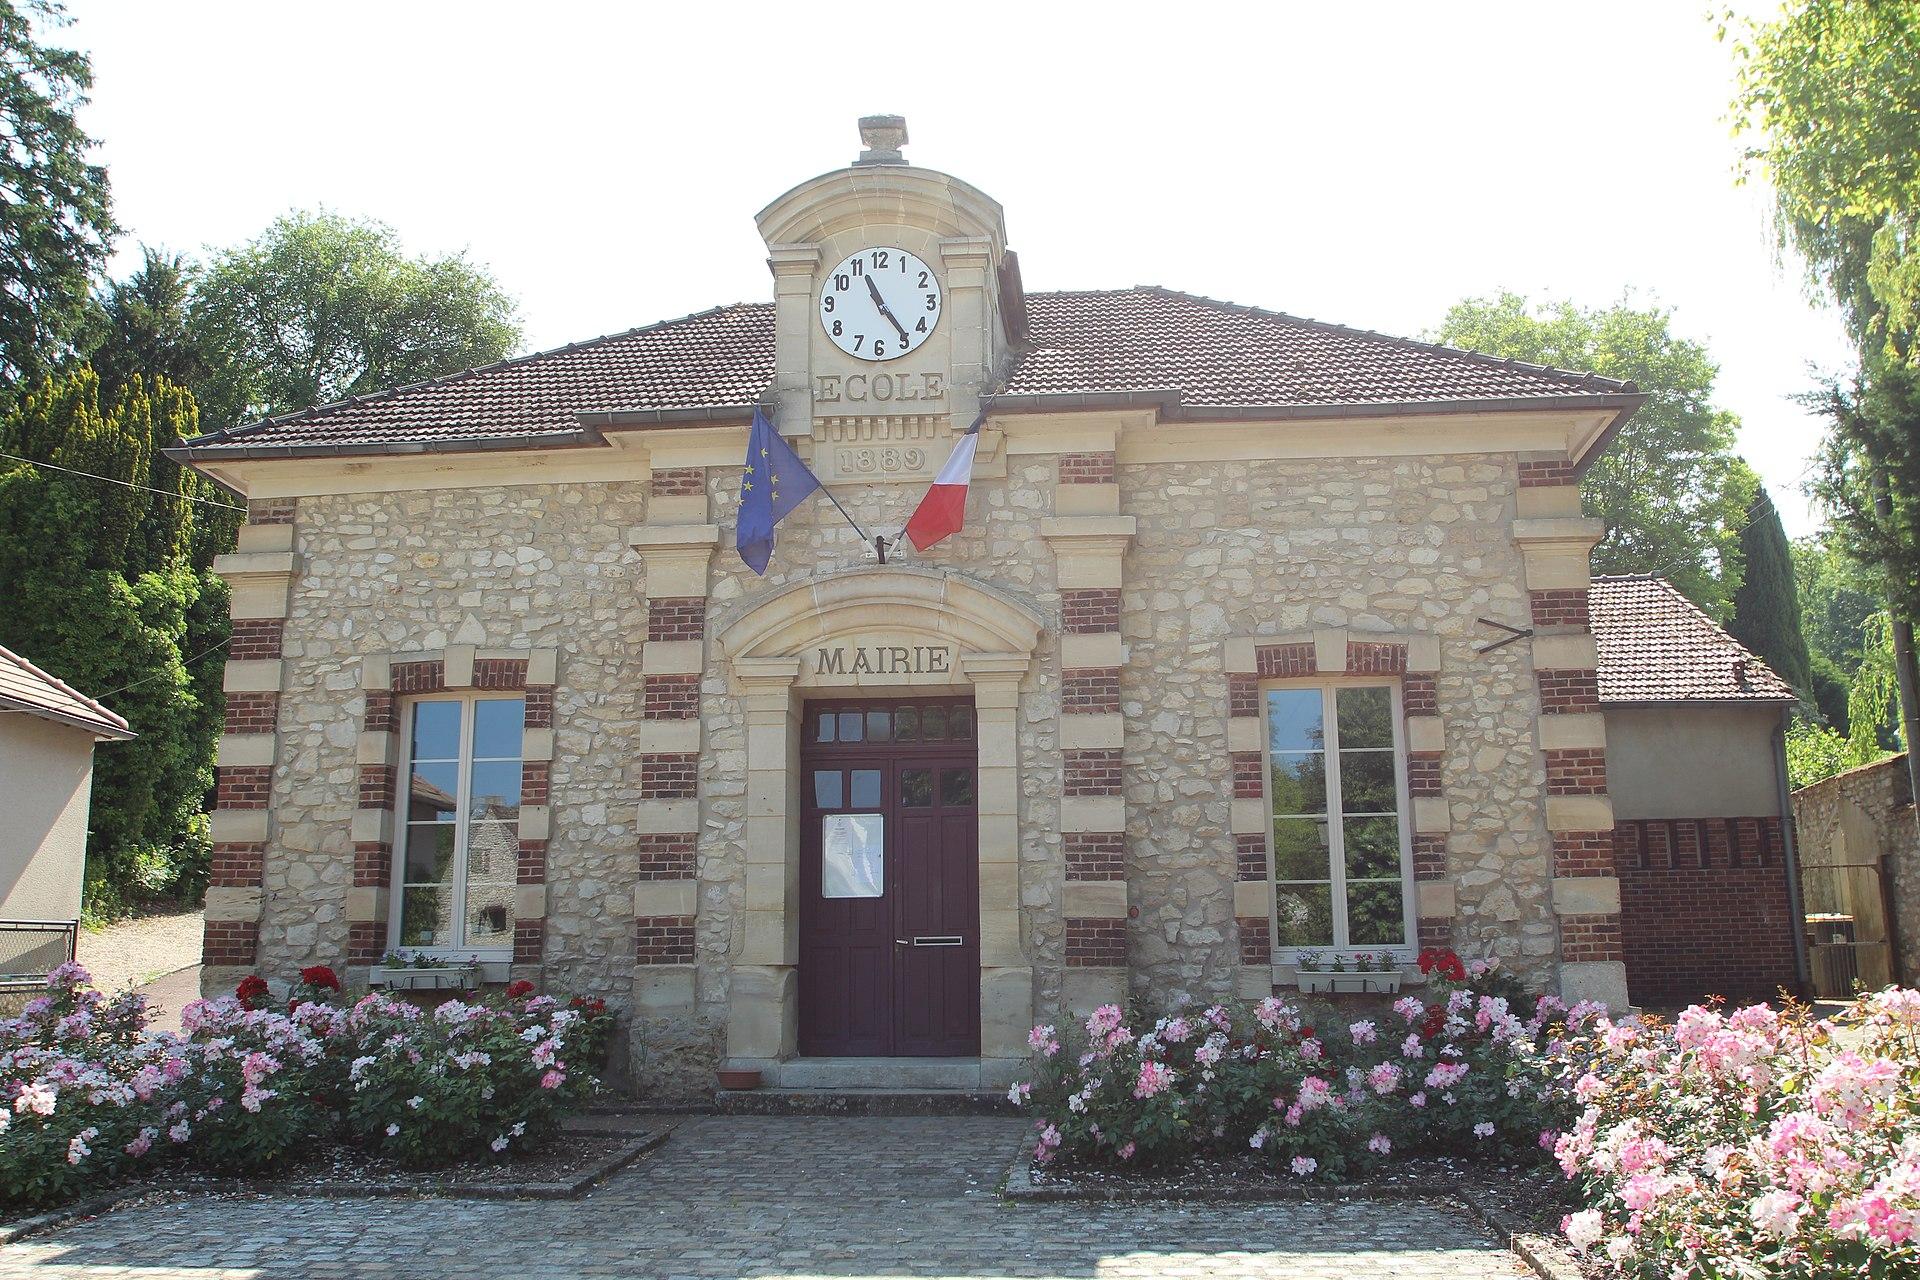 Villette yvelines wikipedia for Visite gratuite dans les yvelines